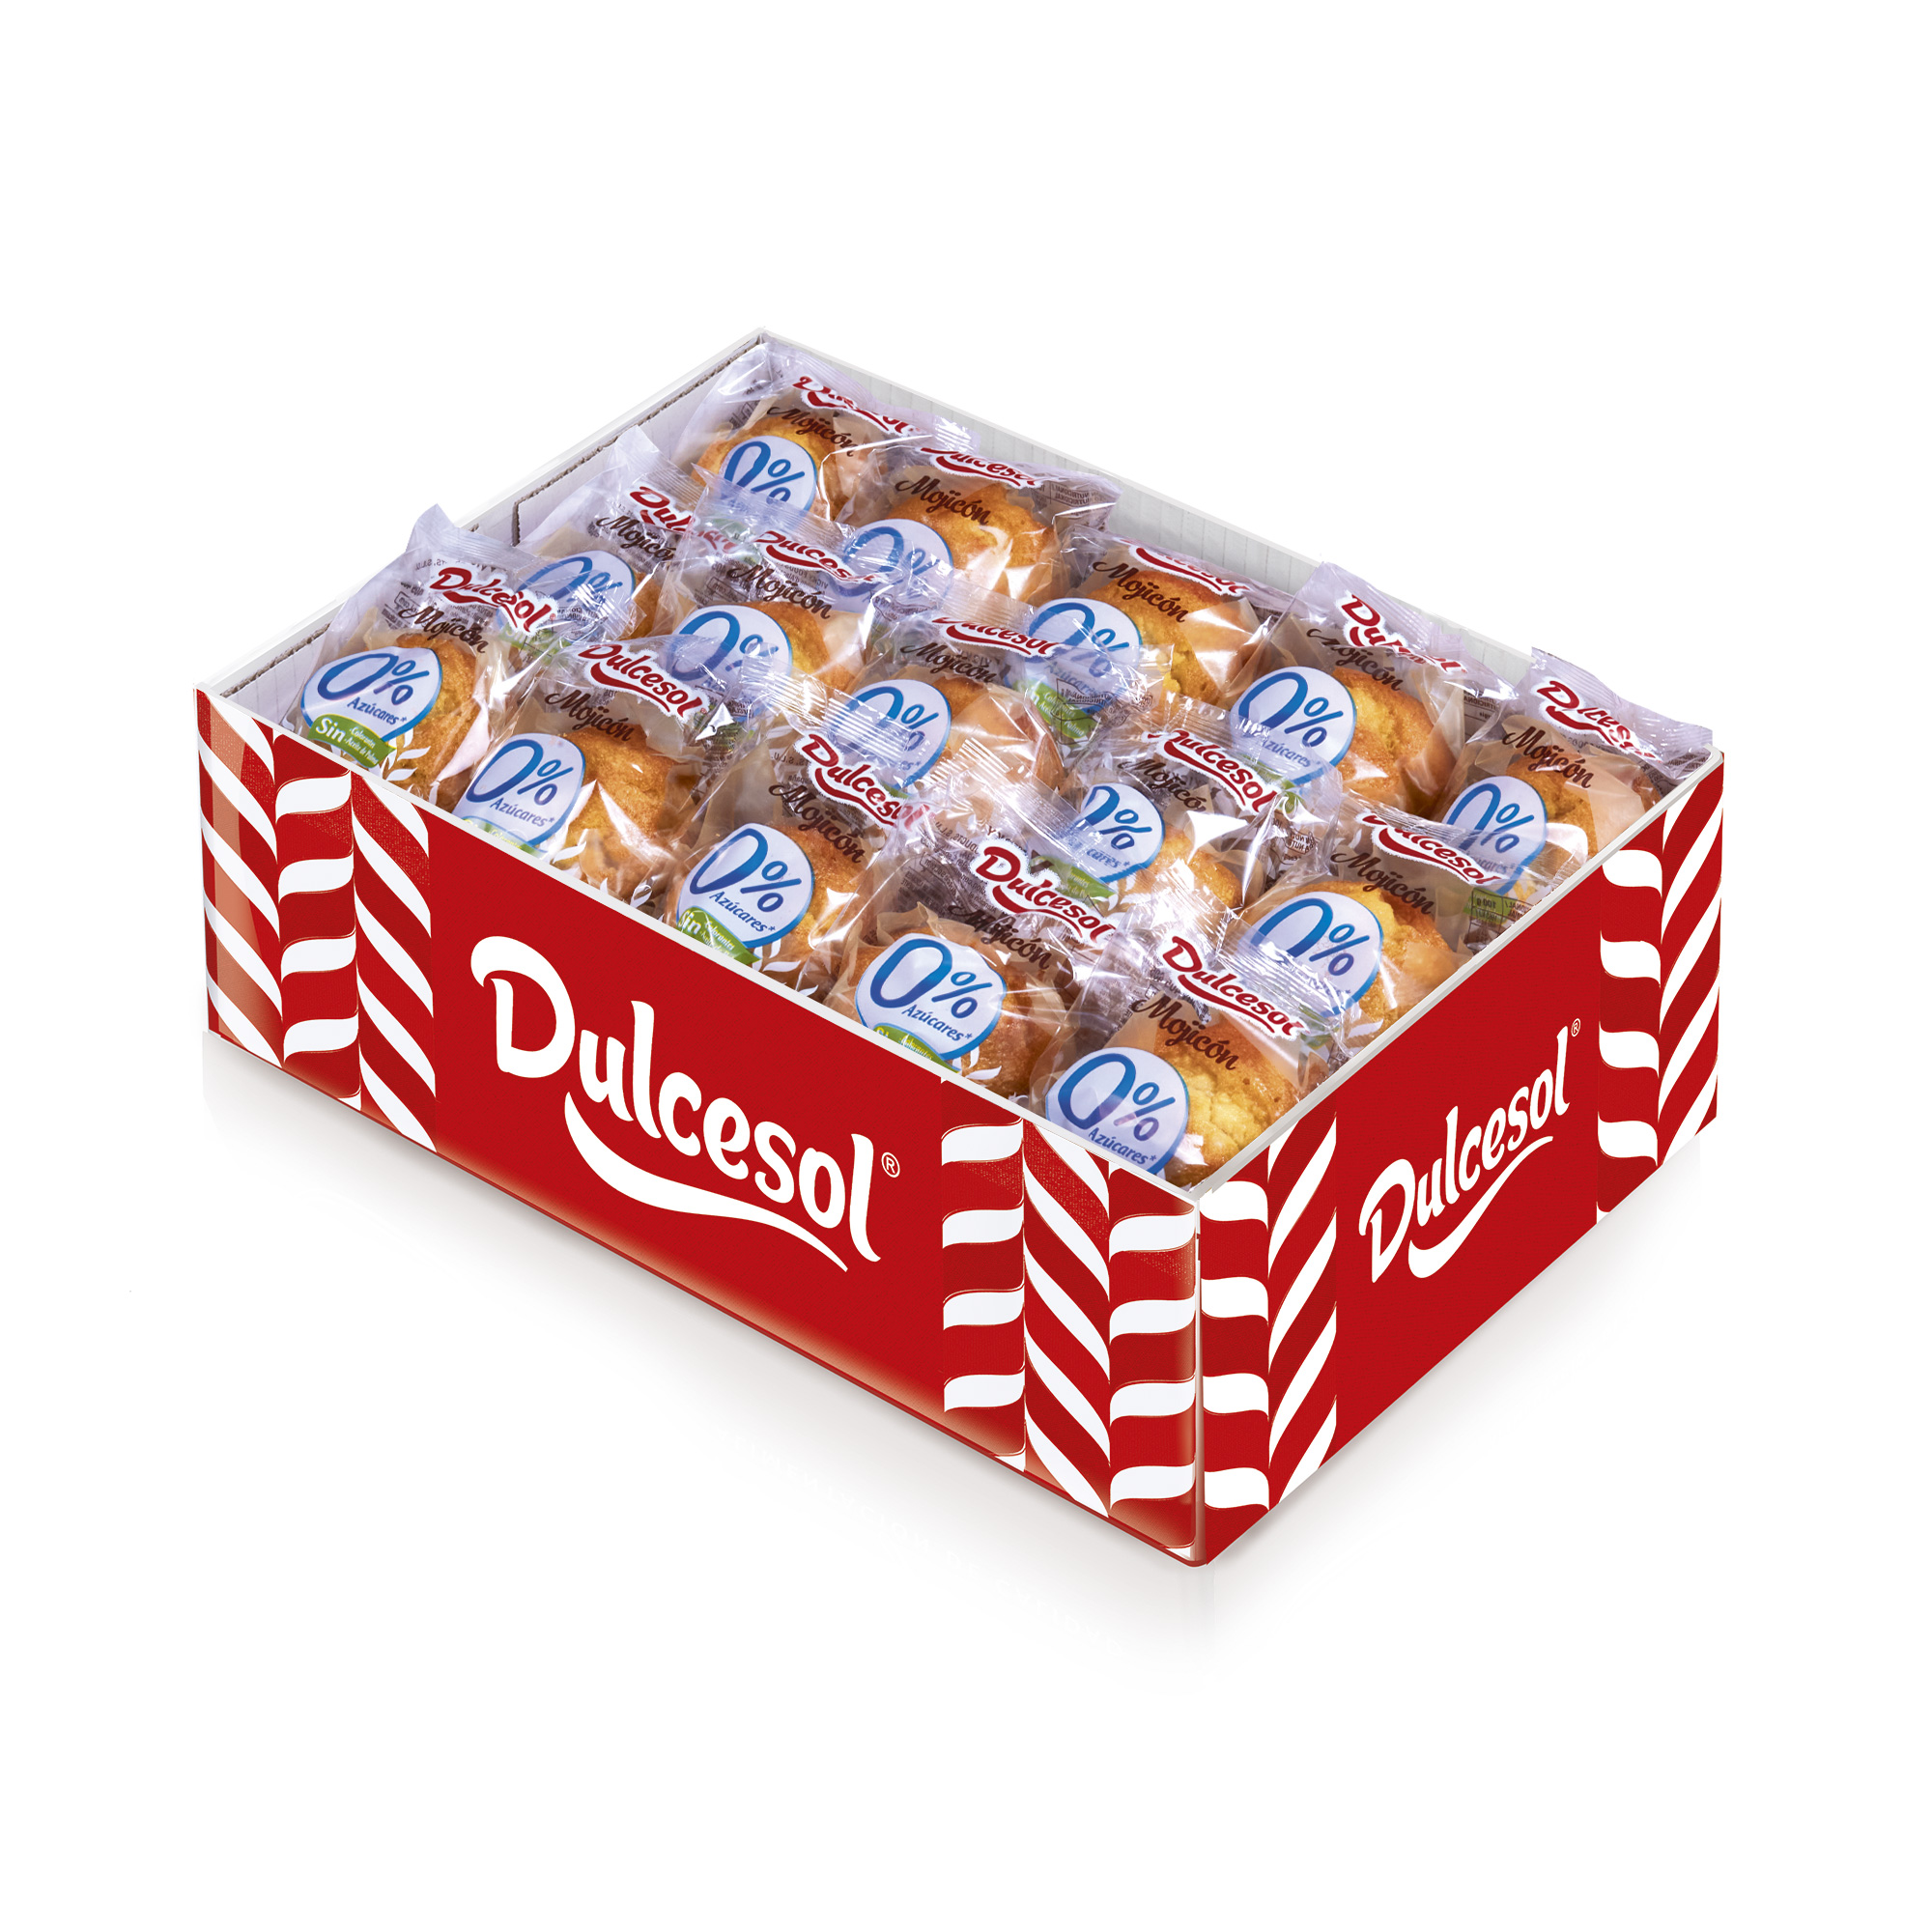 Mojicón senza zuccheri aggiunti - Box 1.8Kg